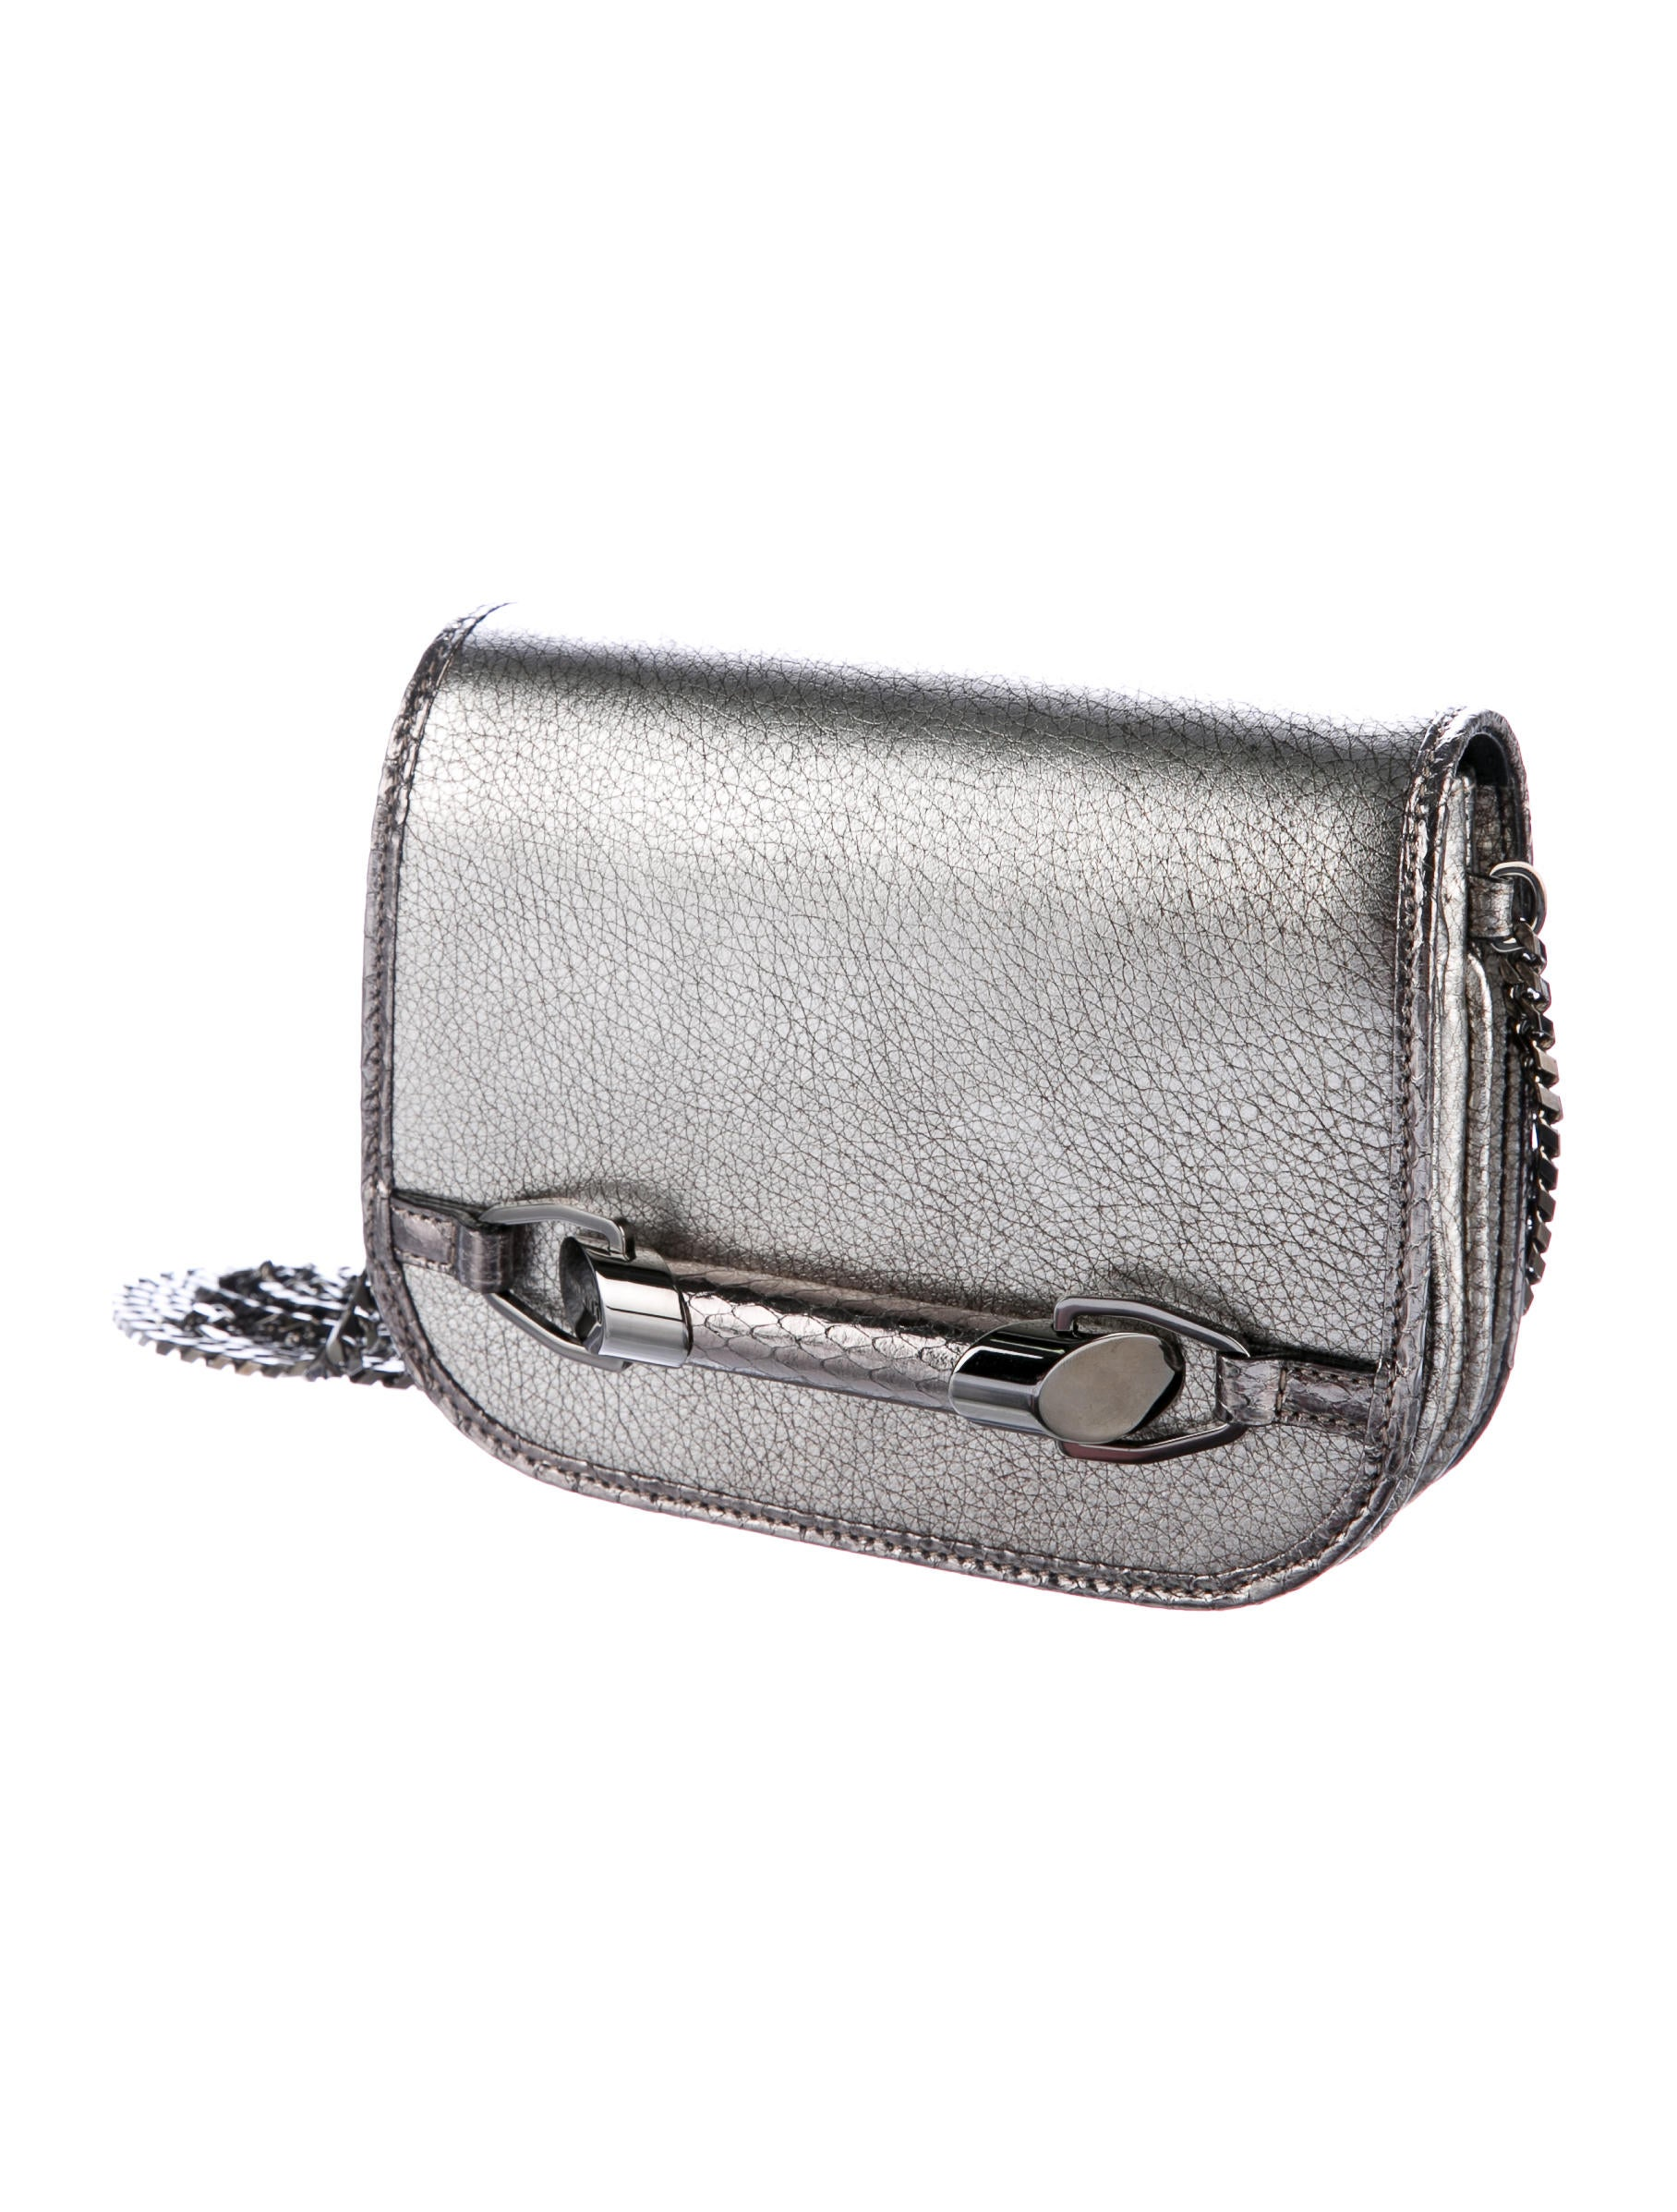 Jimmy Choo Embossed Metallic Crossbody Bag - Handbags ...